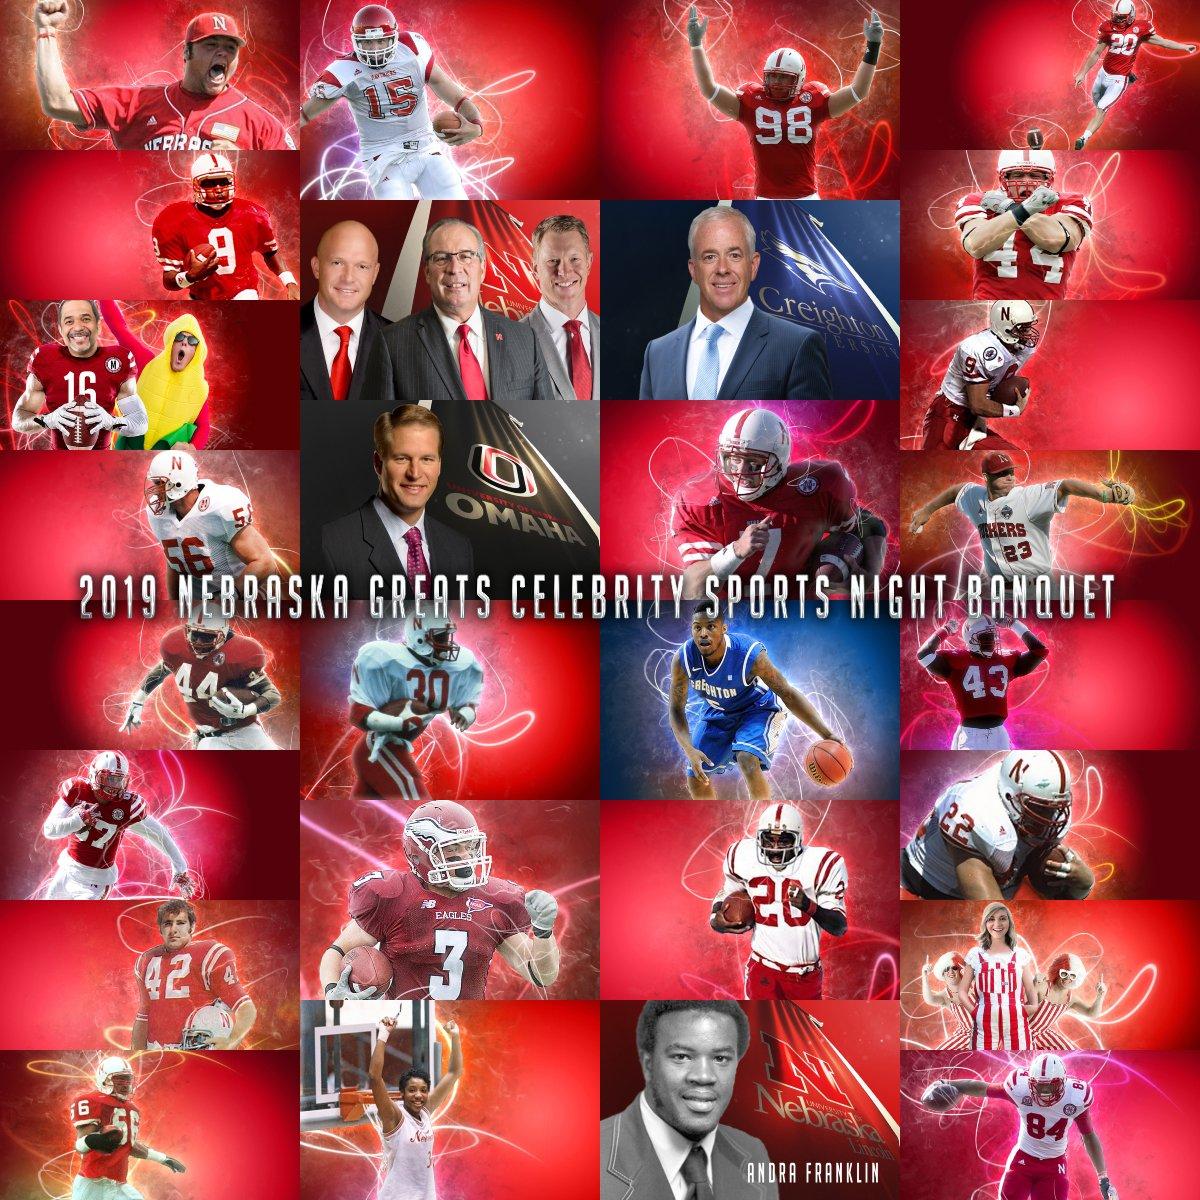 Nebraska Greats Celebrity Sports Night Banquet (@NGFBanquet) | Twitter